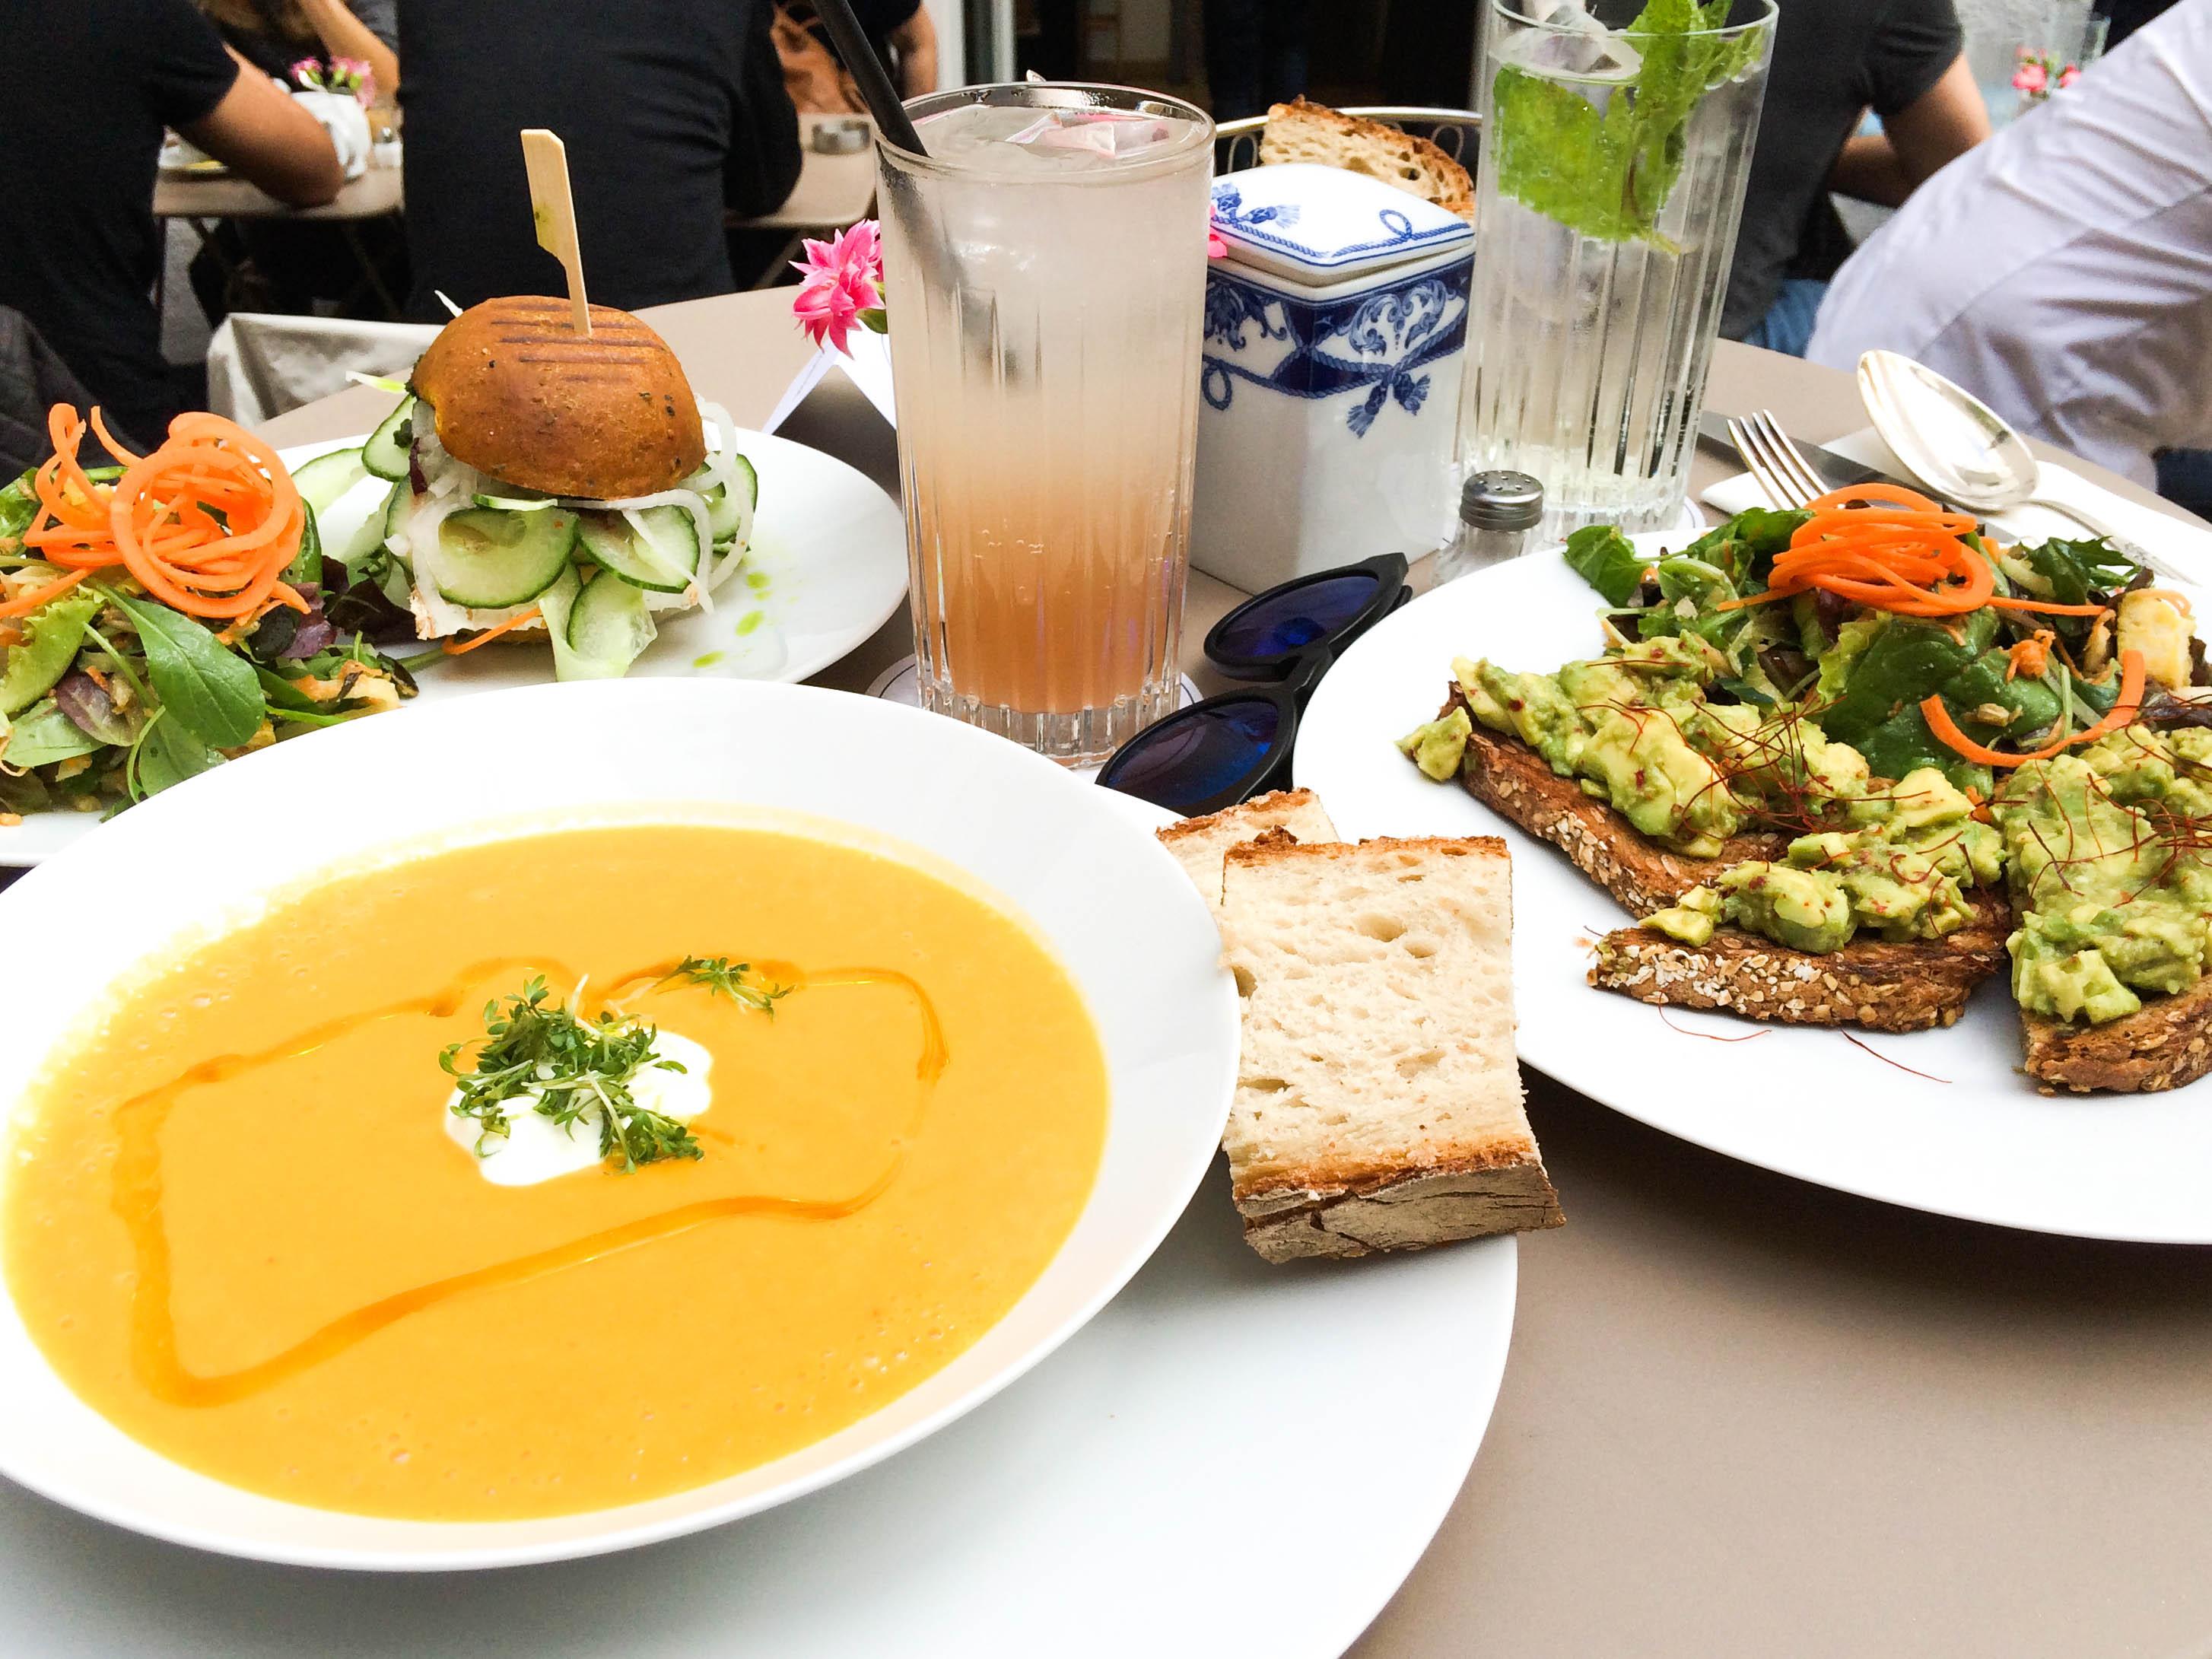 Stereo-Café-Munich-Hotspot-Lindarella-Vegan-Clean-Healthy-Foodblogger-München-Deutschland-Fitnessblog-1